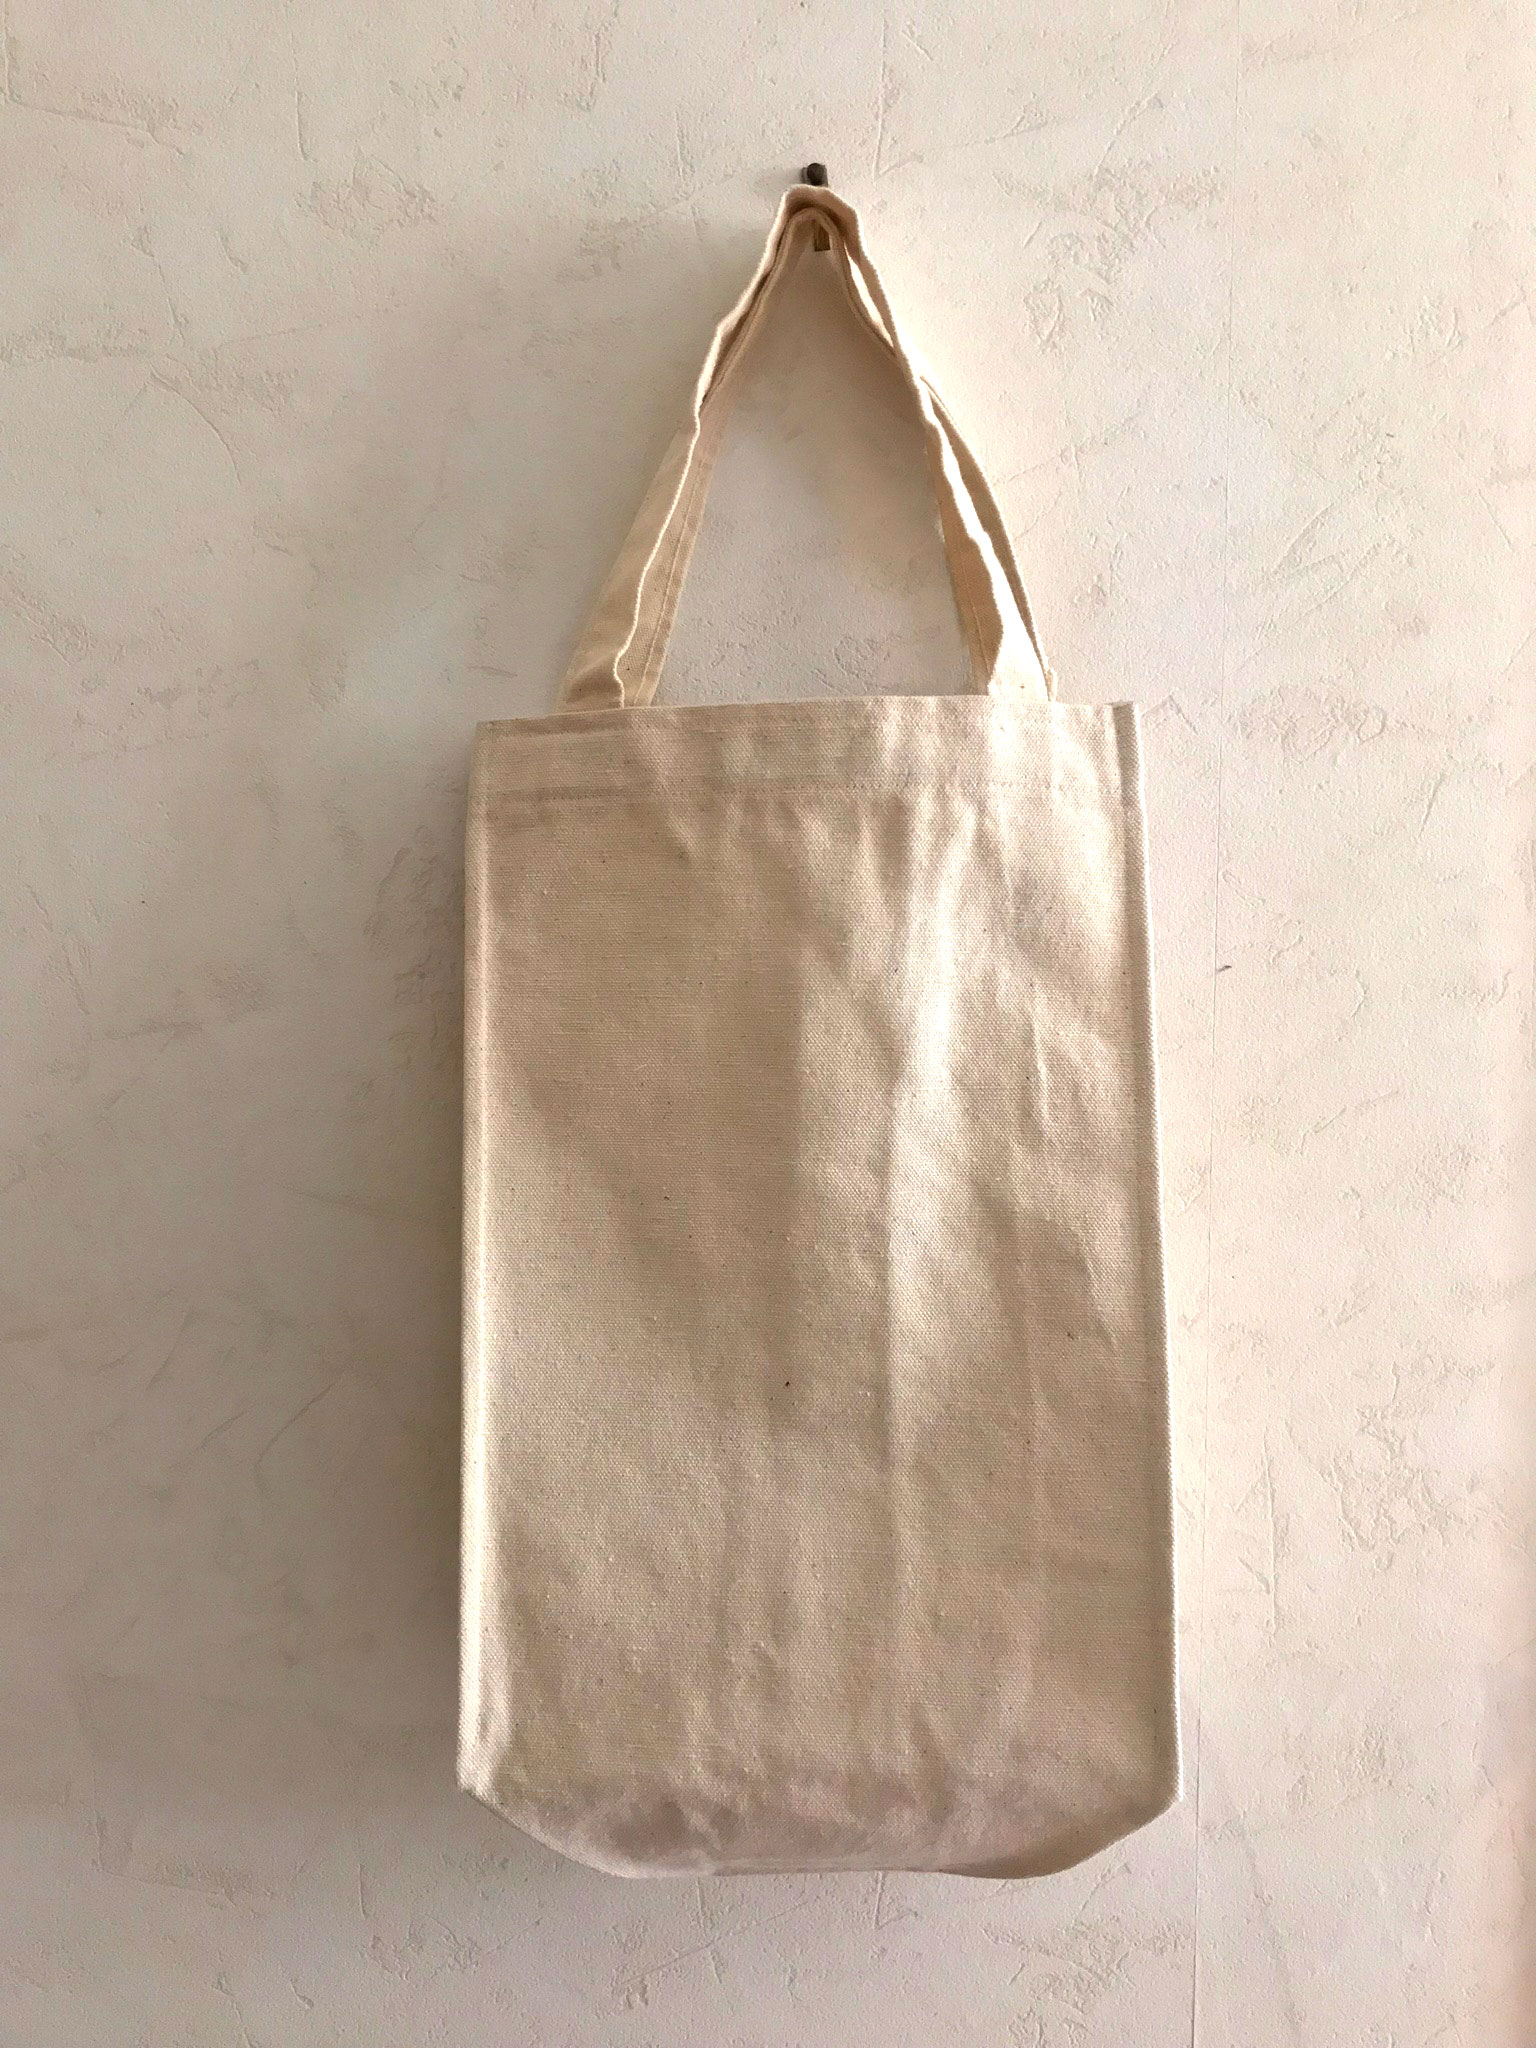 Sac à vin - M.R. Design - 20x30x15 cm